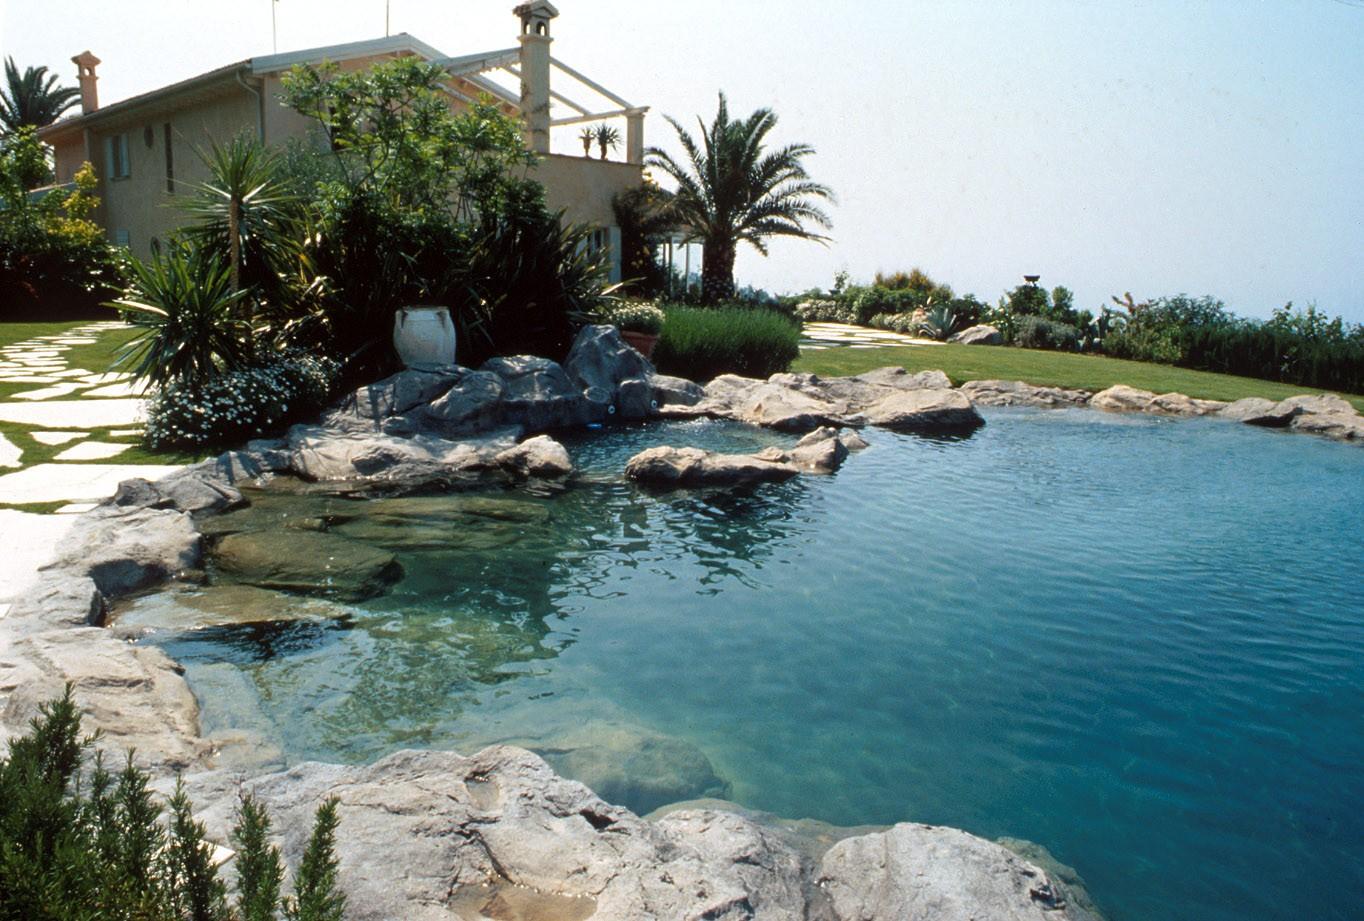 The incredible reconstruction of a natural basin - Swimming Pools